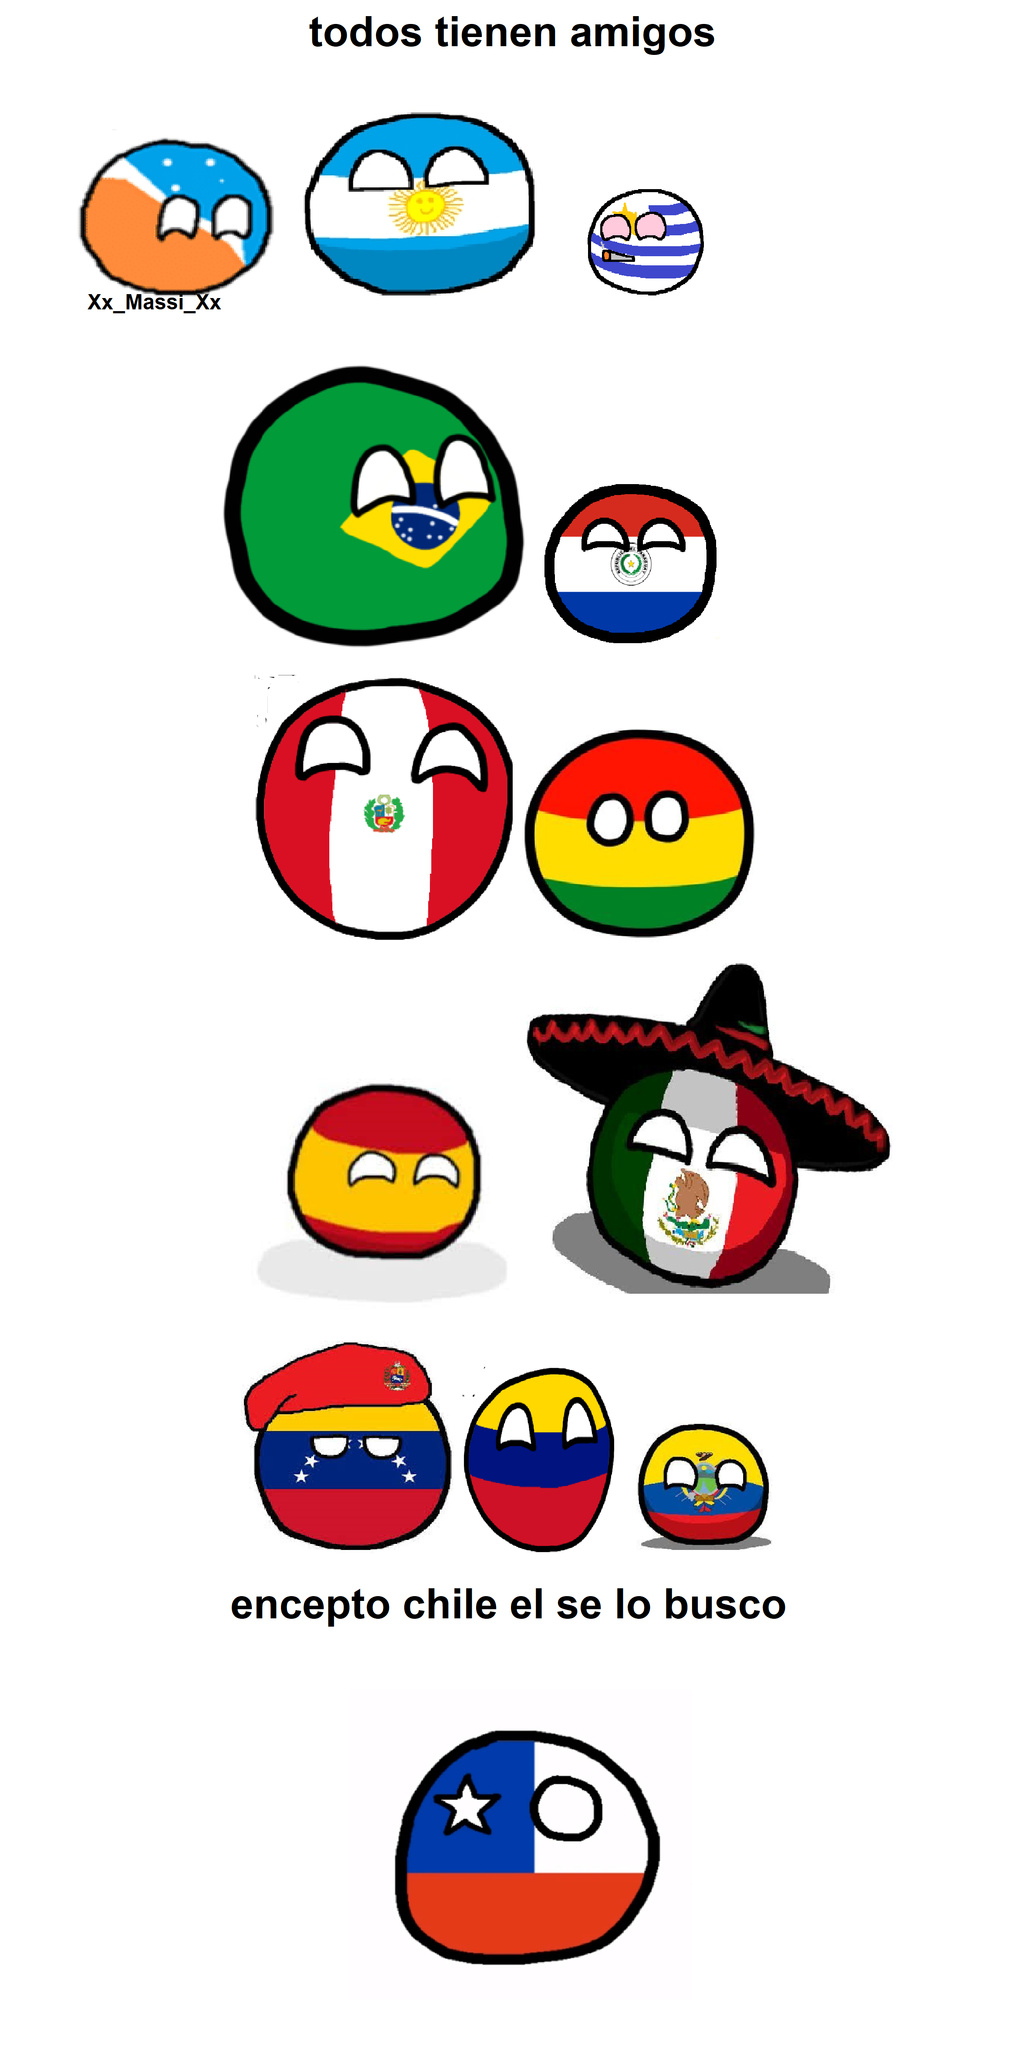 pobre chile :( - meme